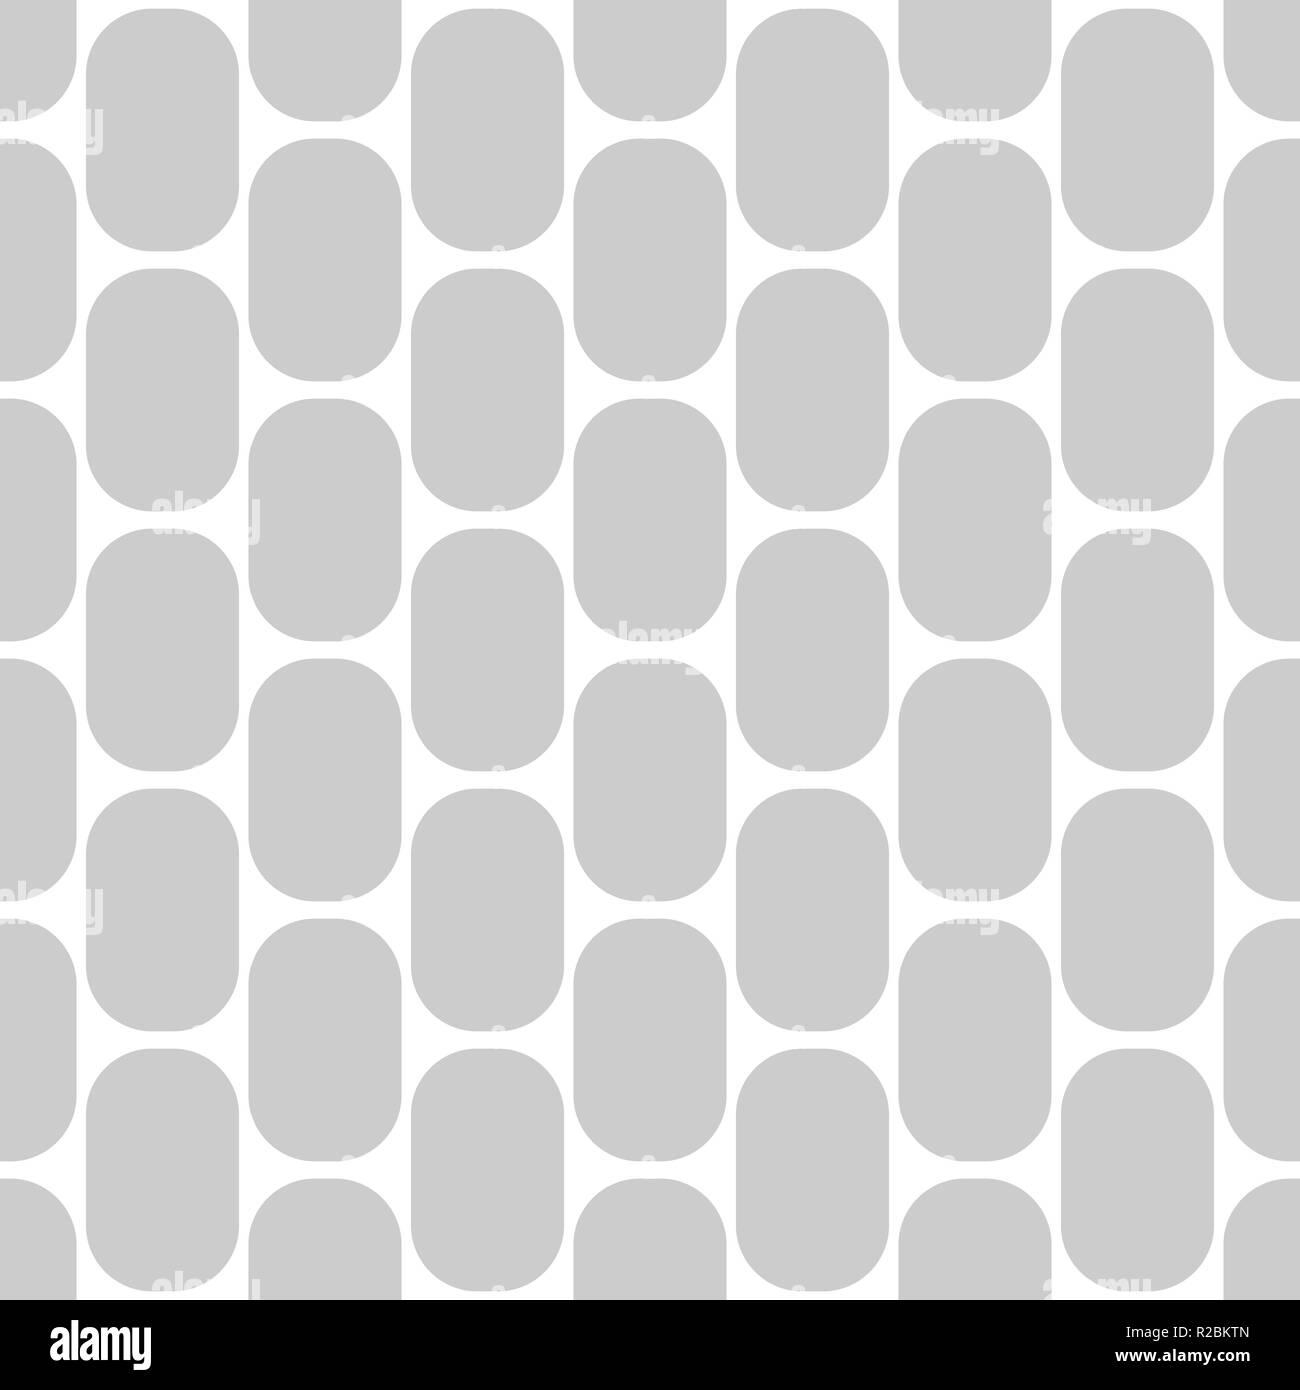 Seamless Retro Pattern Gray And White Design For Wallpaper